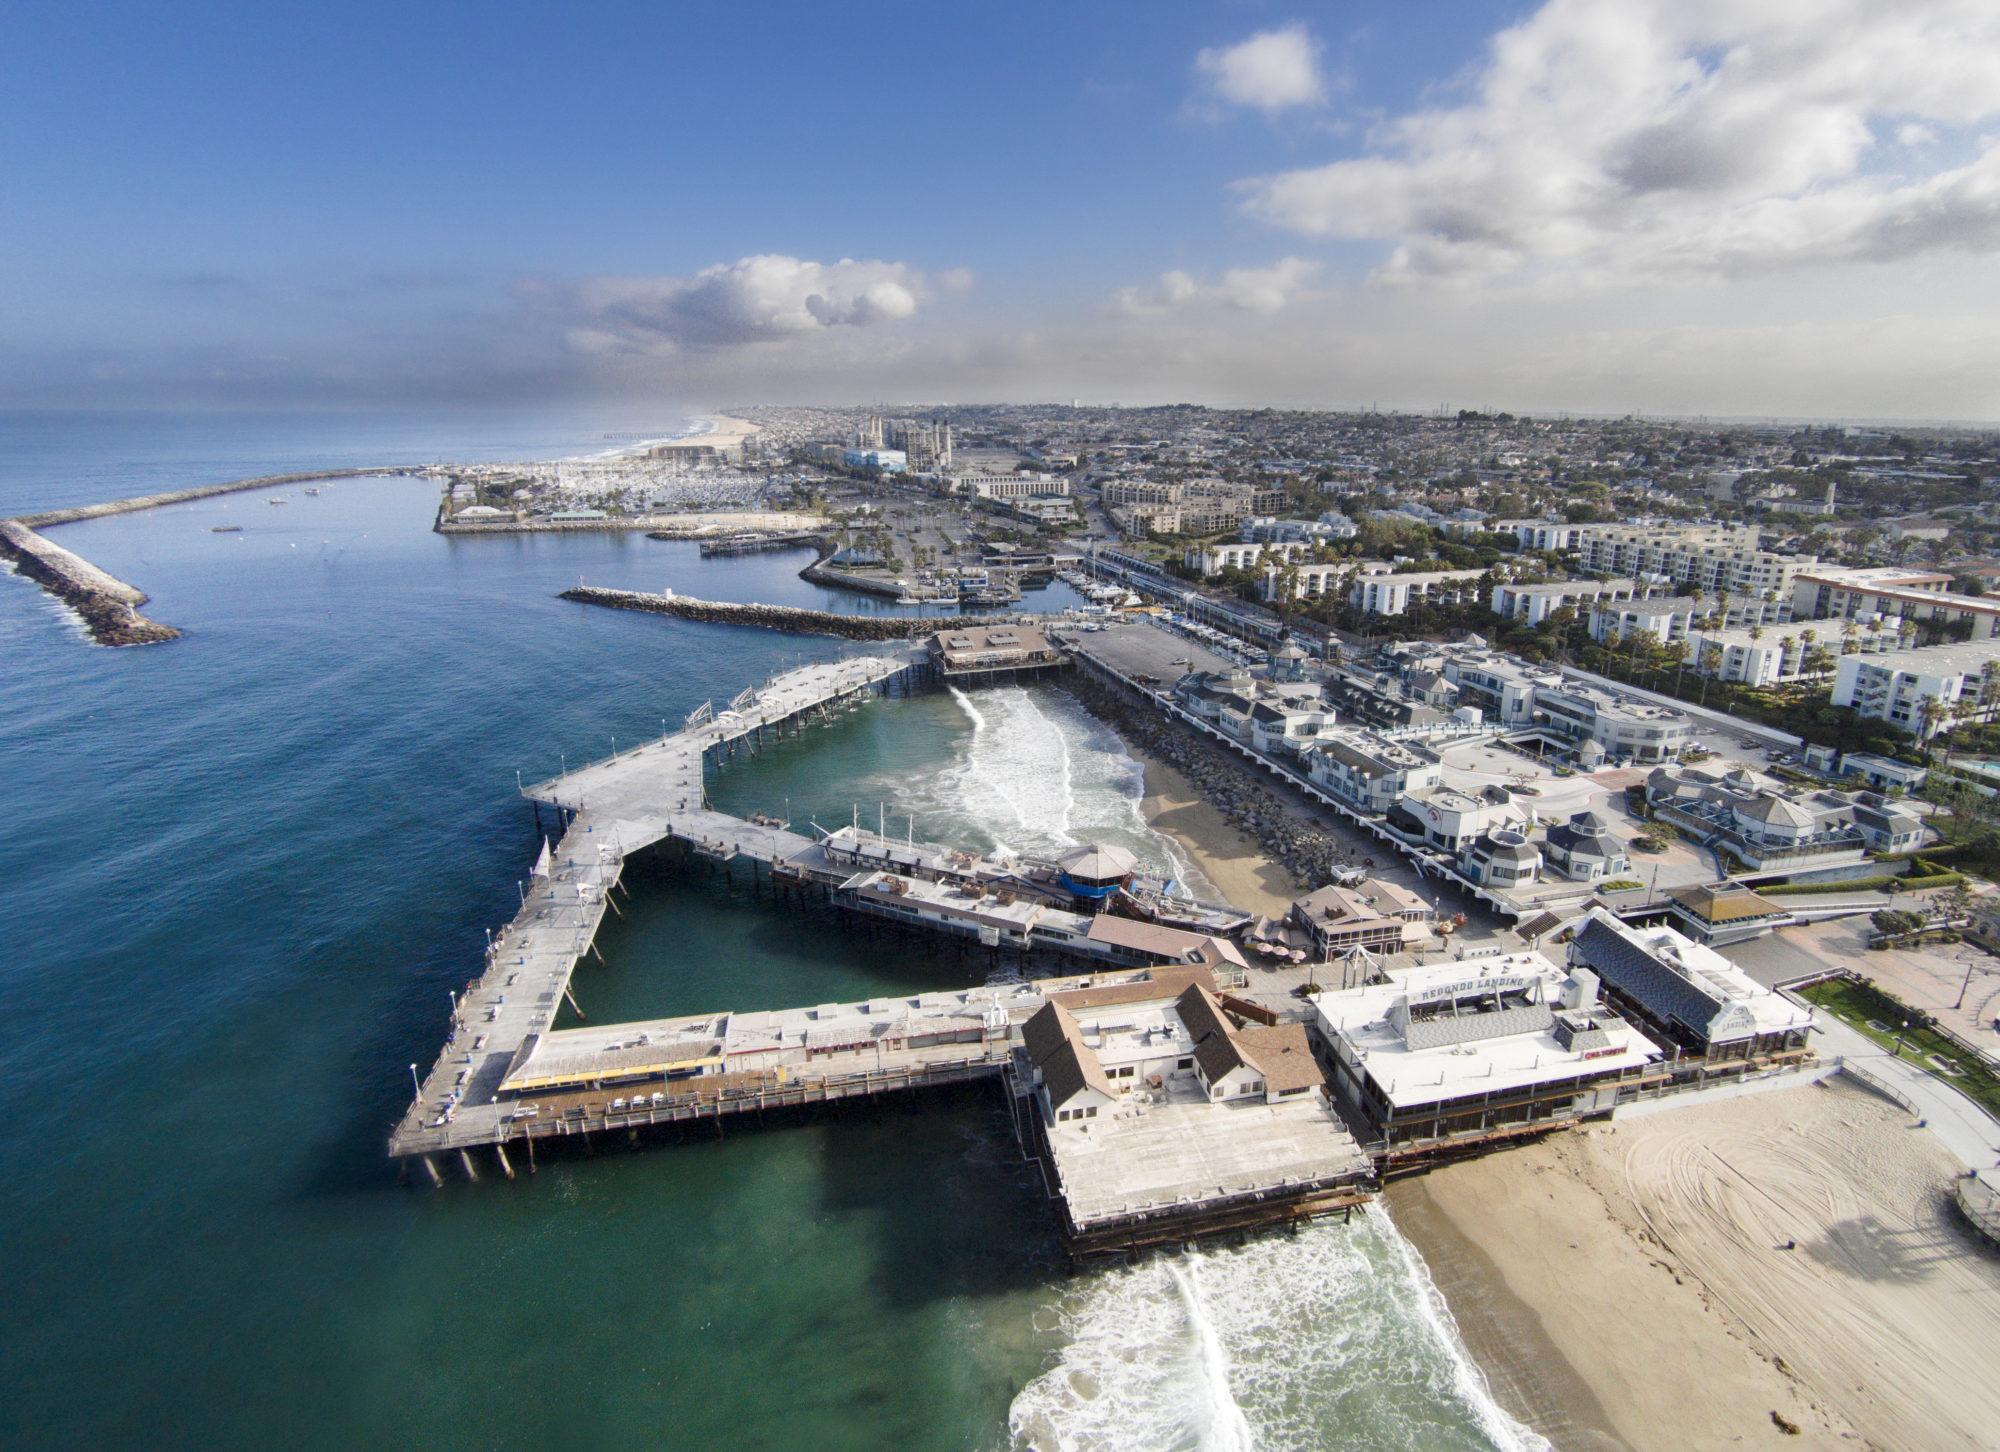 Beach 2016: The Battle of the Redondo Beach Waterfront